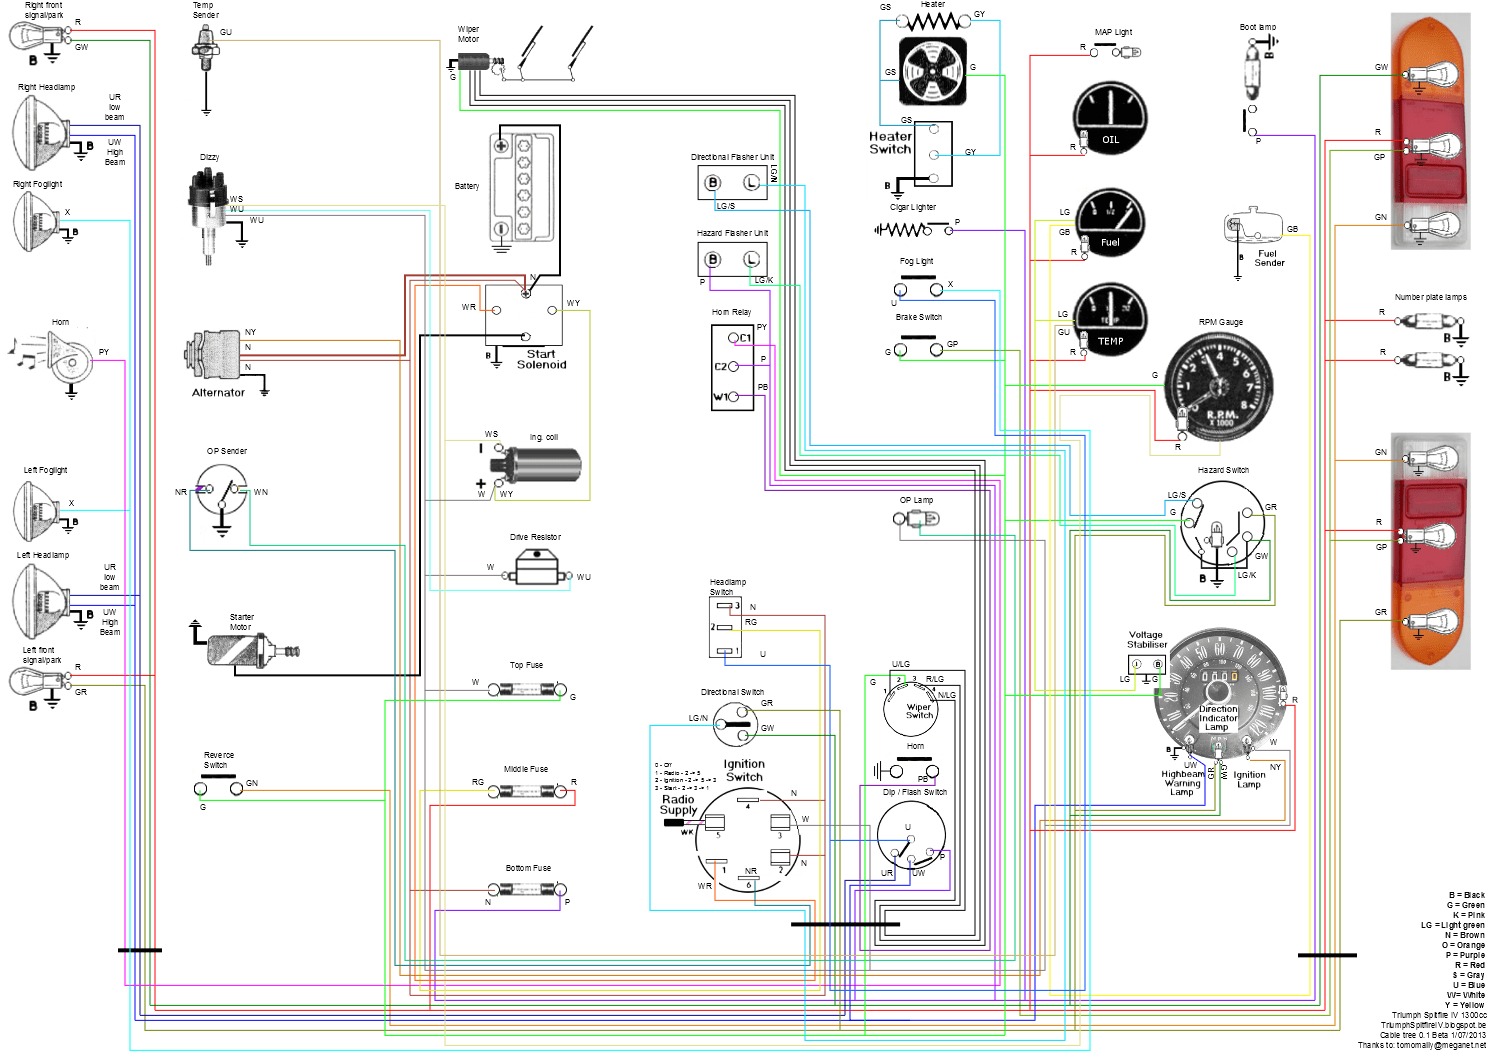 1976 triumph tr6 wiring diagram auto diagram database 76 triumph tr6 wiring diagram